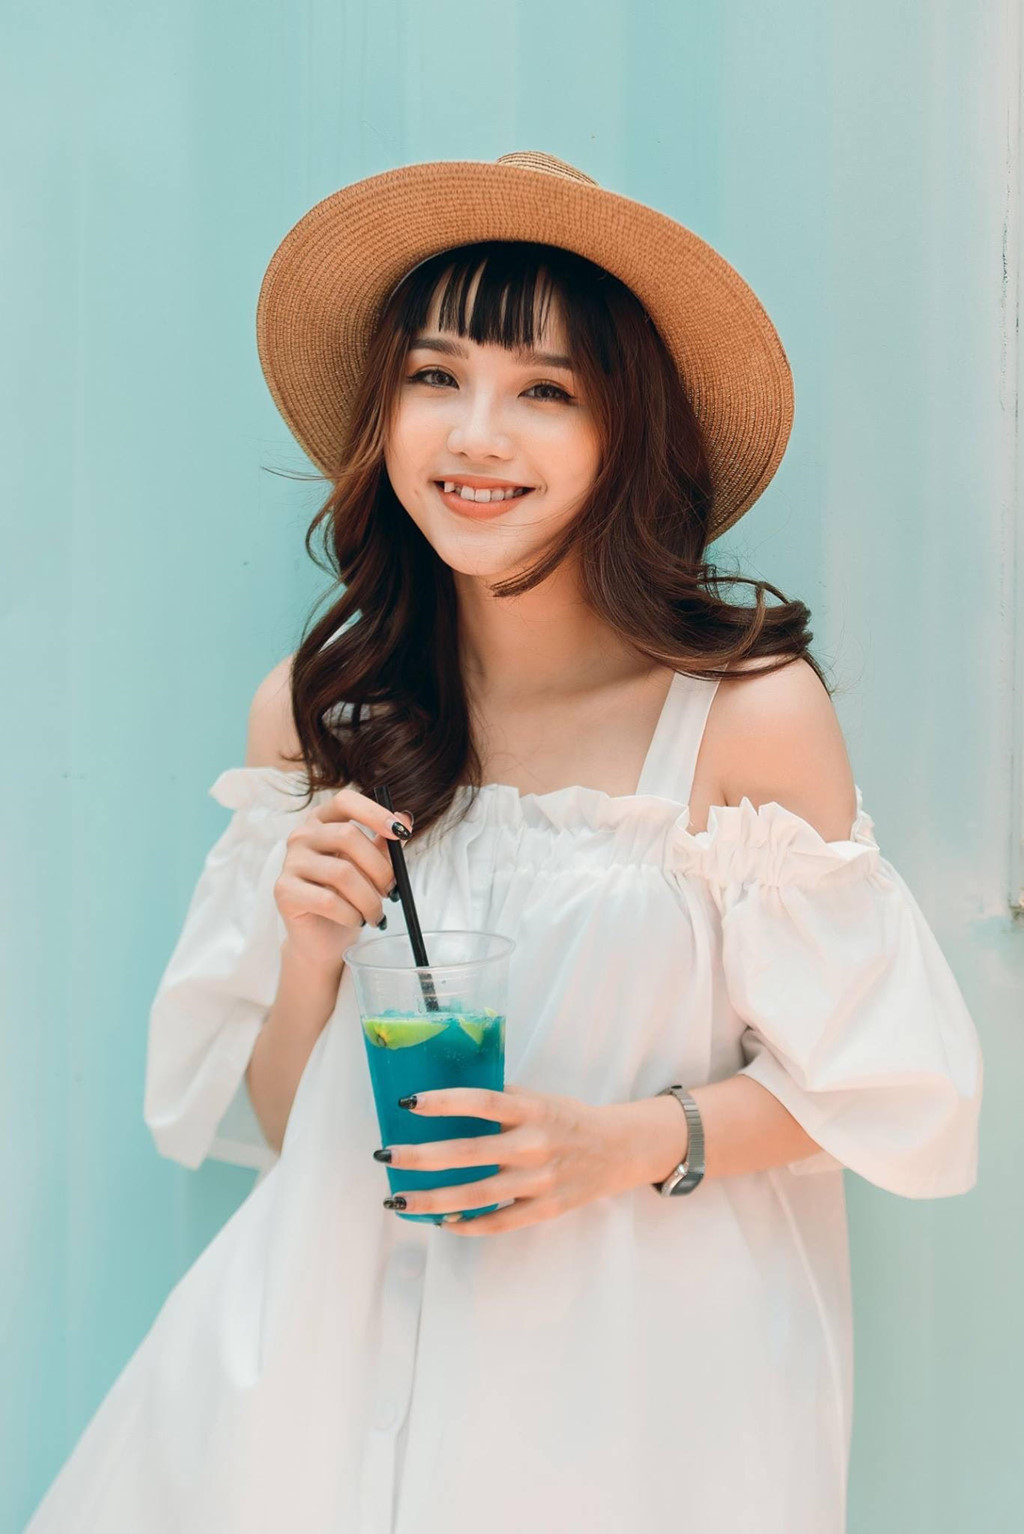 Cuu hot girl THPT Viet Duc dong MV 'Tinh don phuong' cover la ai? hinh anh 4